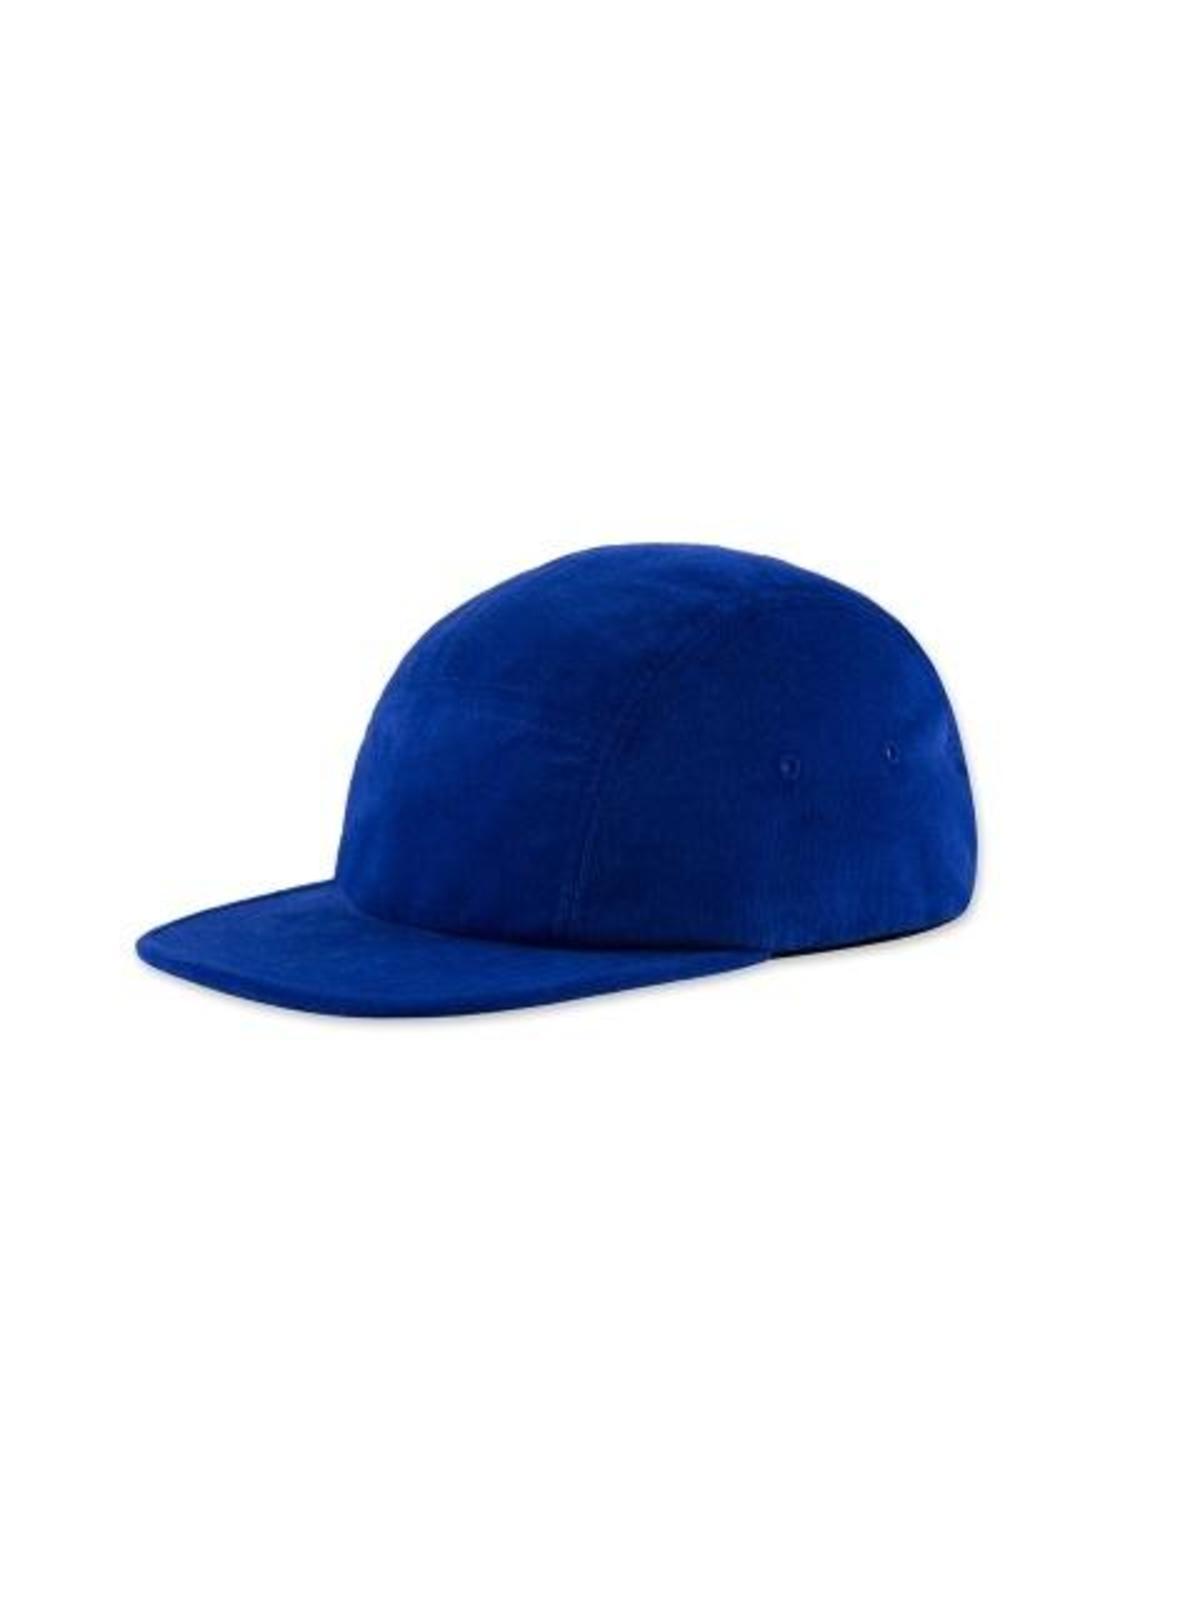 deb105a2a04 Corduroy Camp Cap Blue